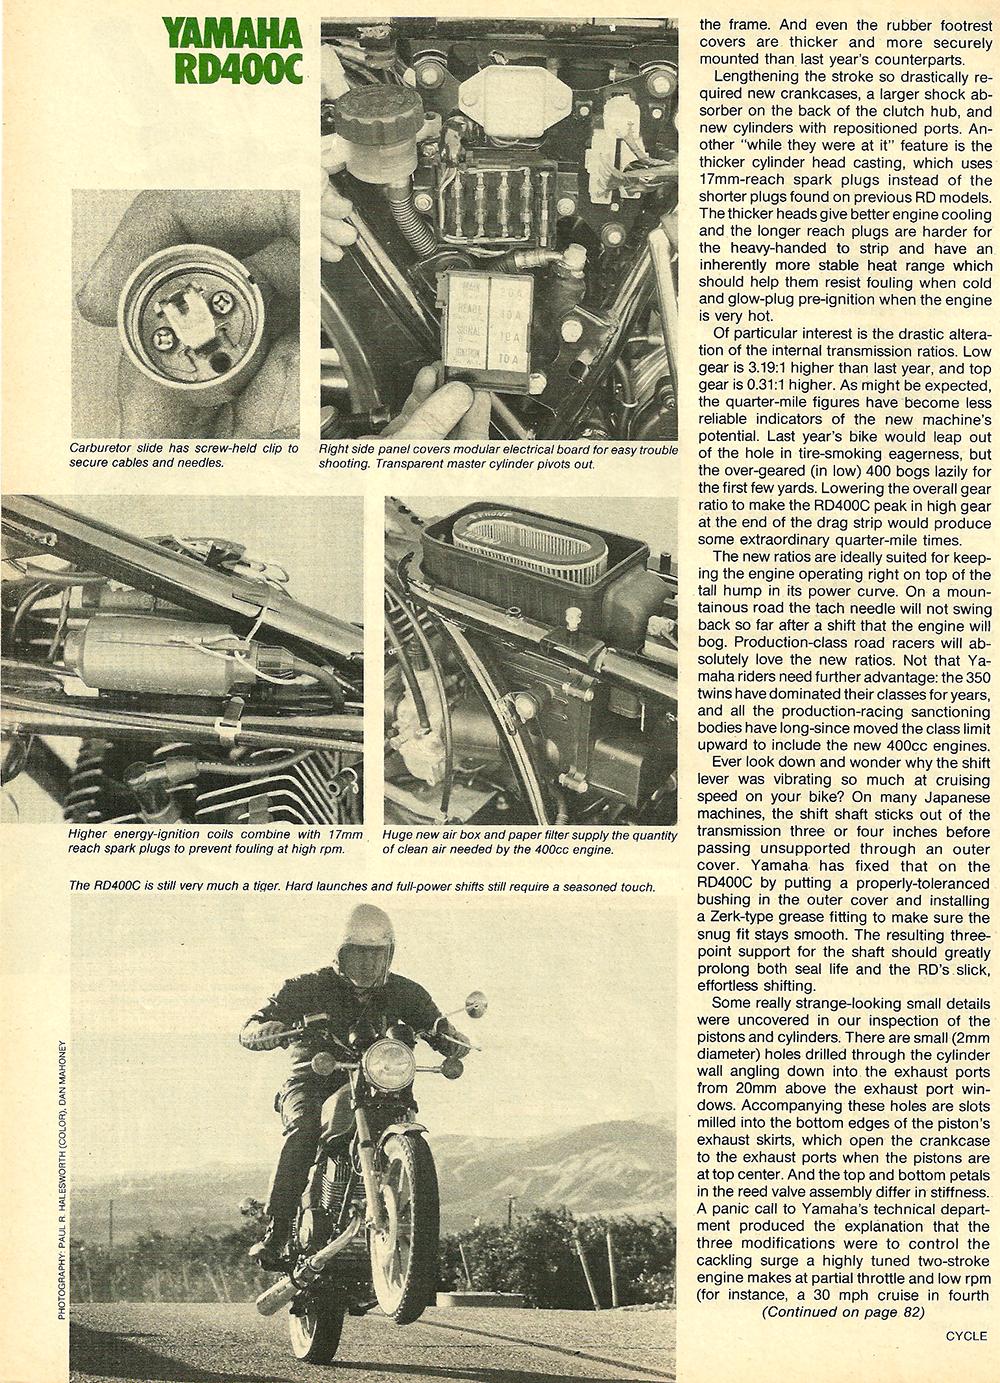 1976 Yamaha RD400C road test 5.jpg